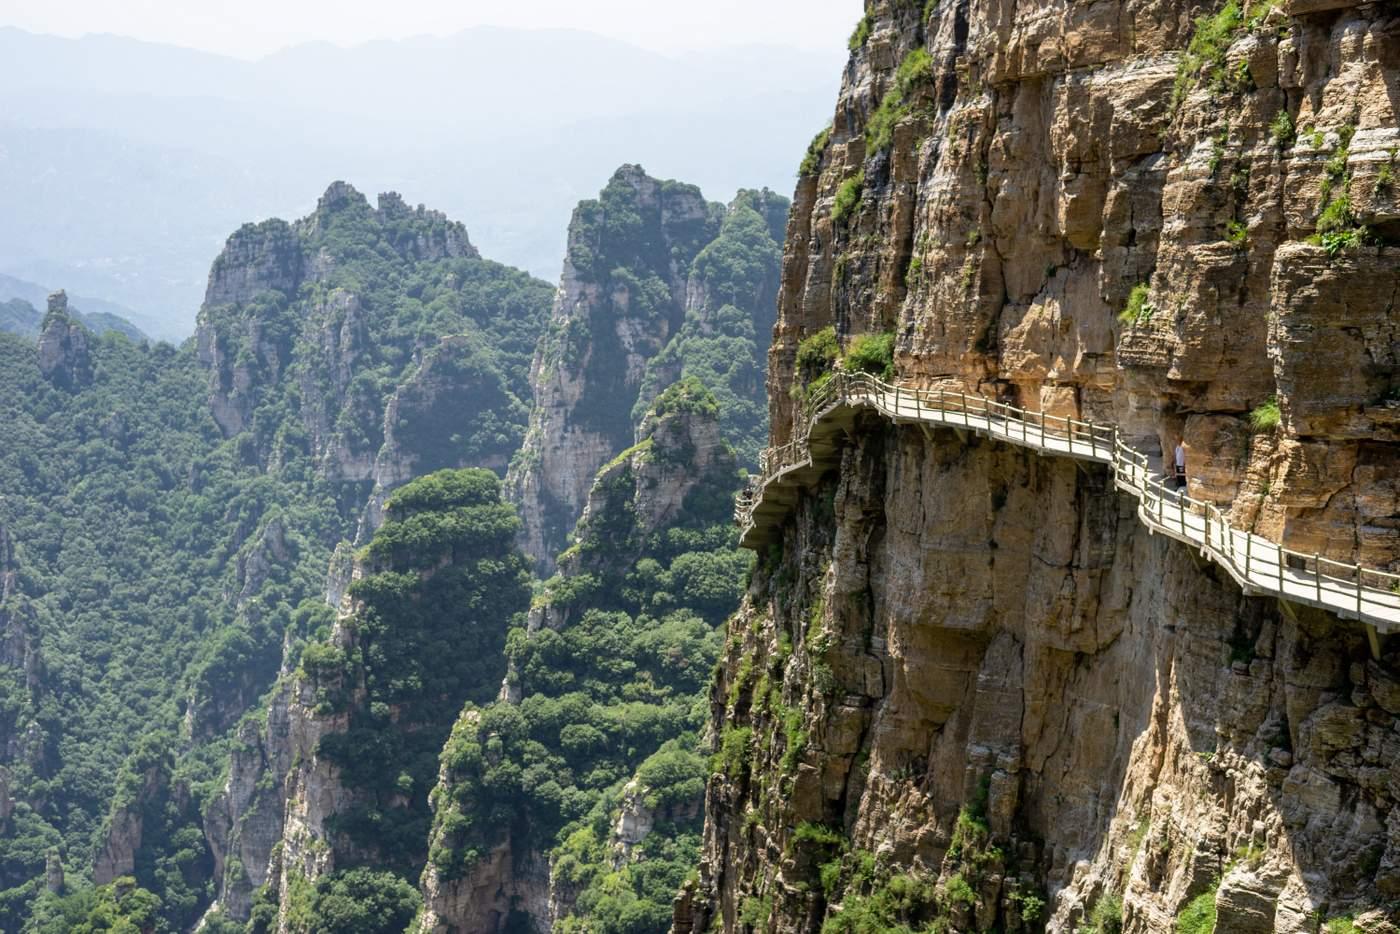 מטיילים בסין